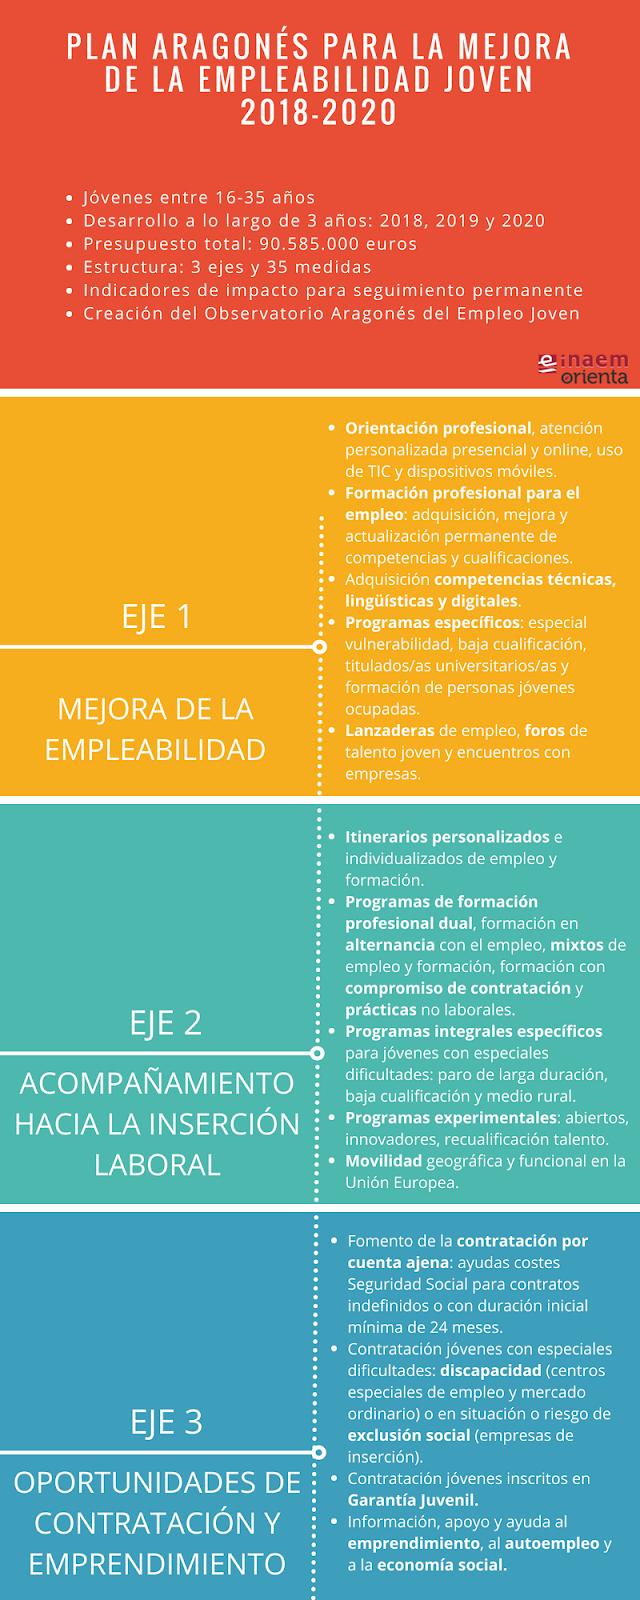 Plan Aragonés para la Mejora de la Empleabilidad Joven 2018-2020